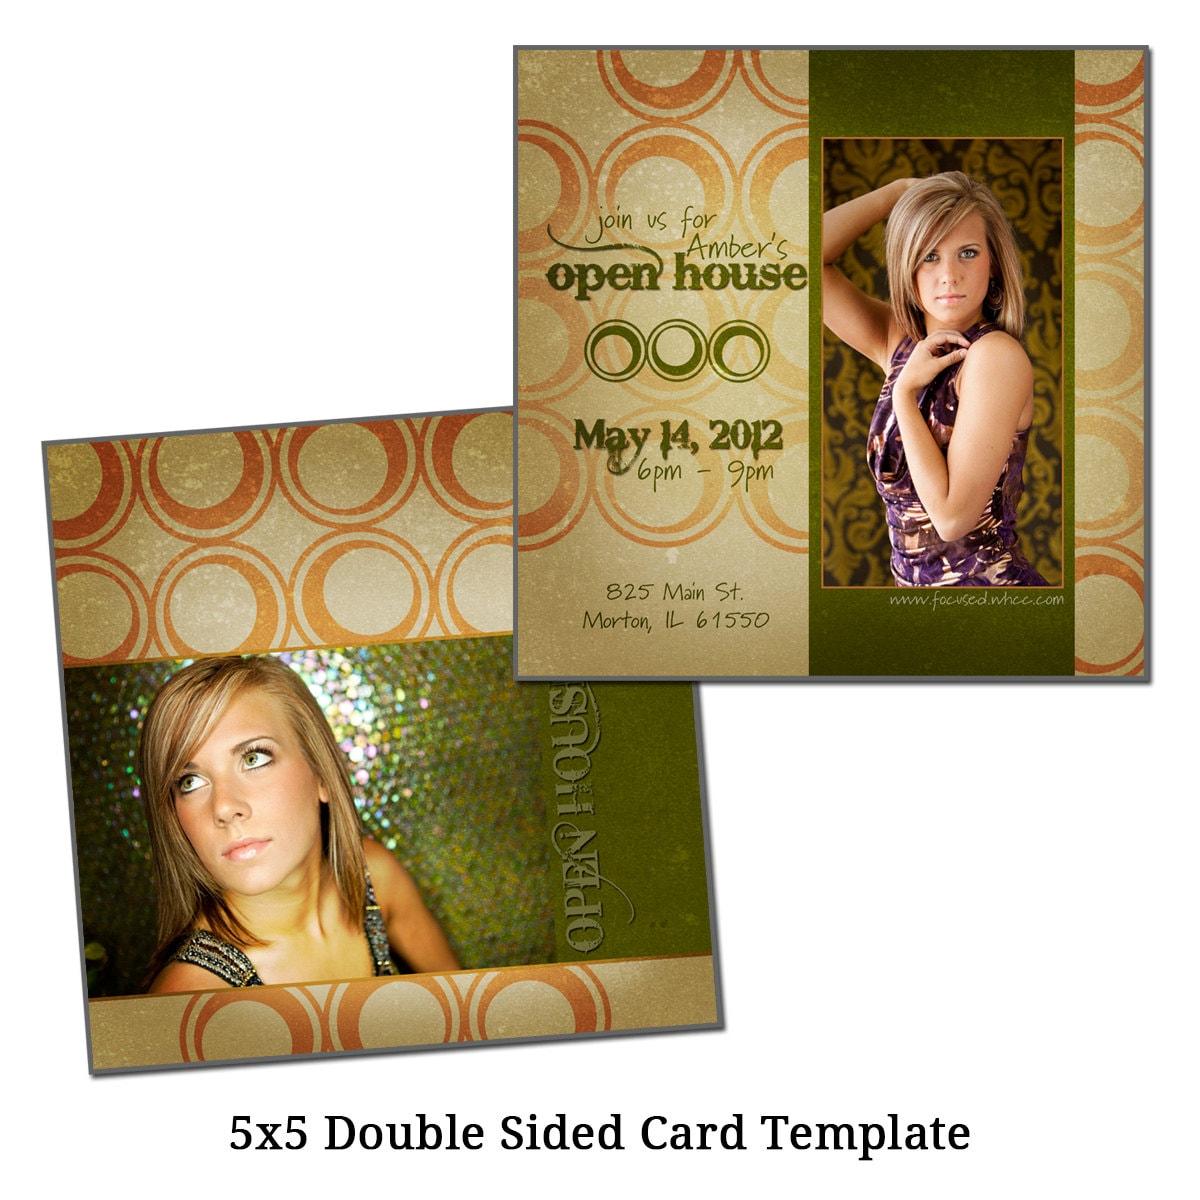 5x5 double sided card template stylish senior digital file. Black Bedroom Furniture Sets. Home Design Ideas